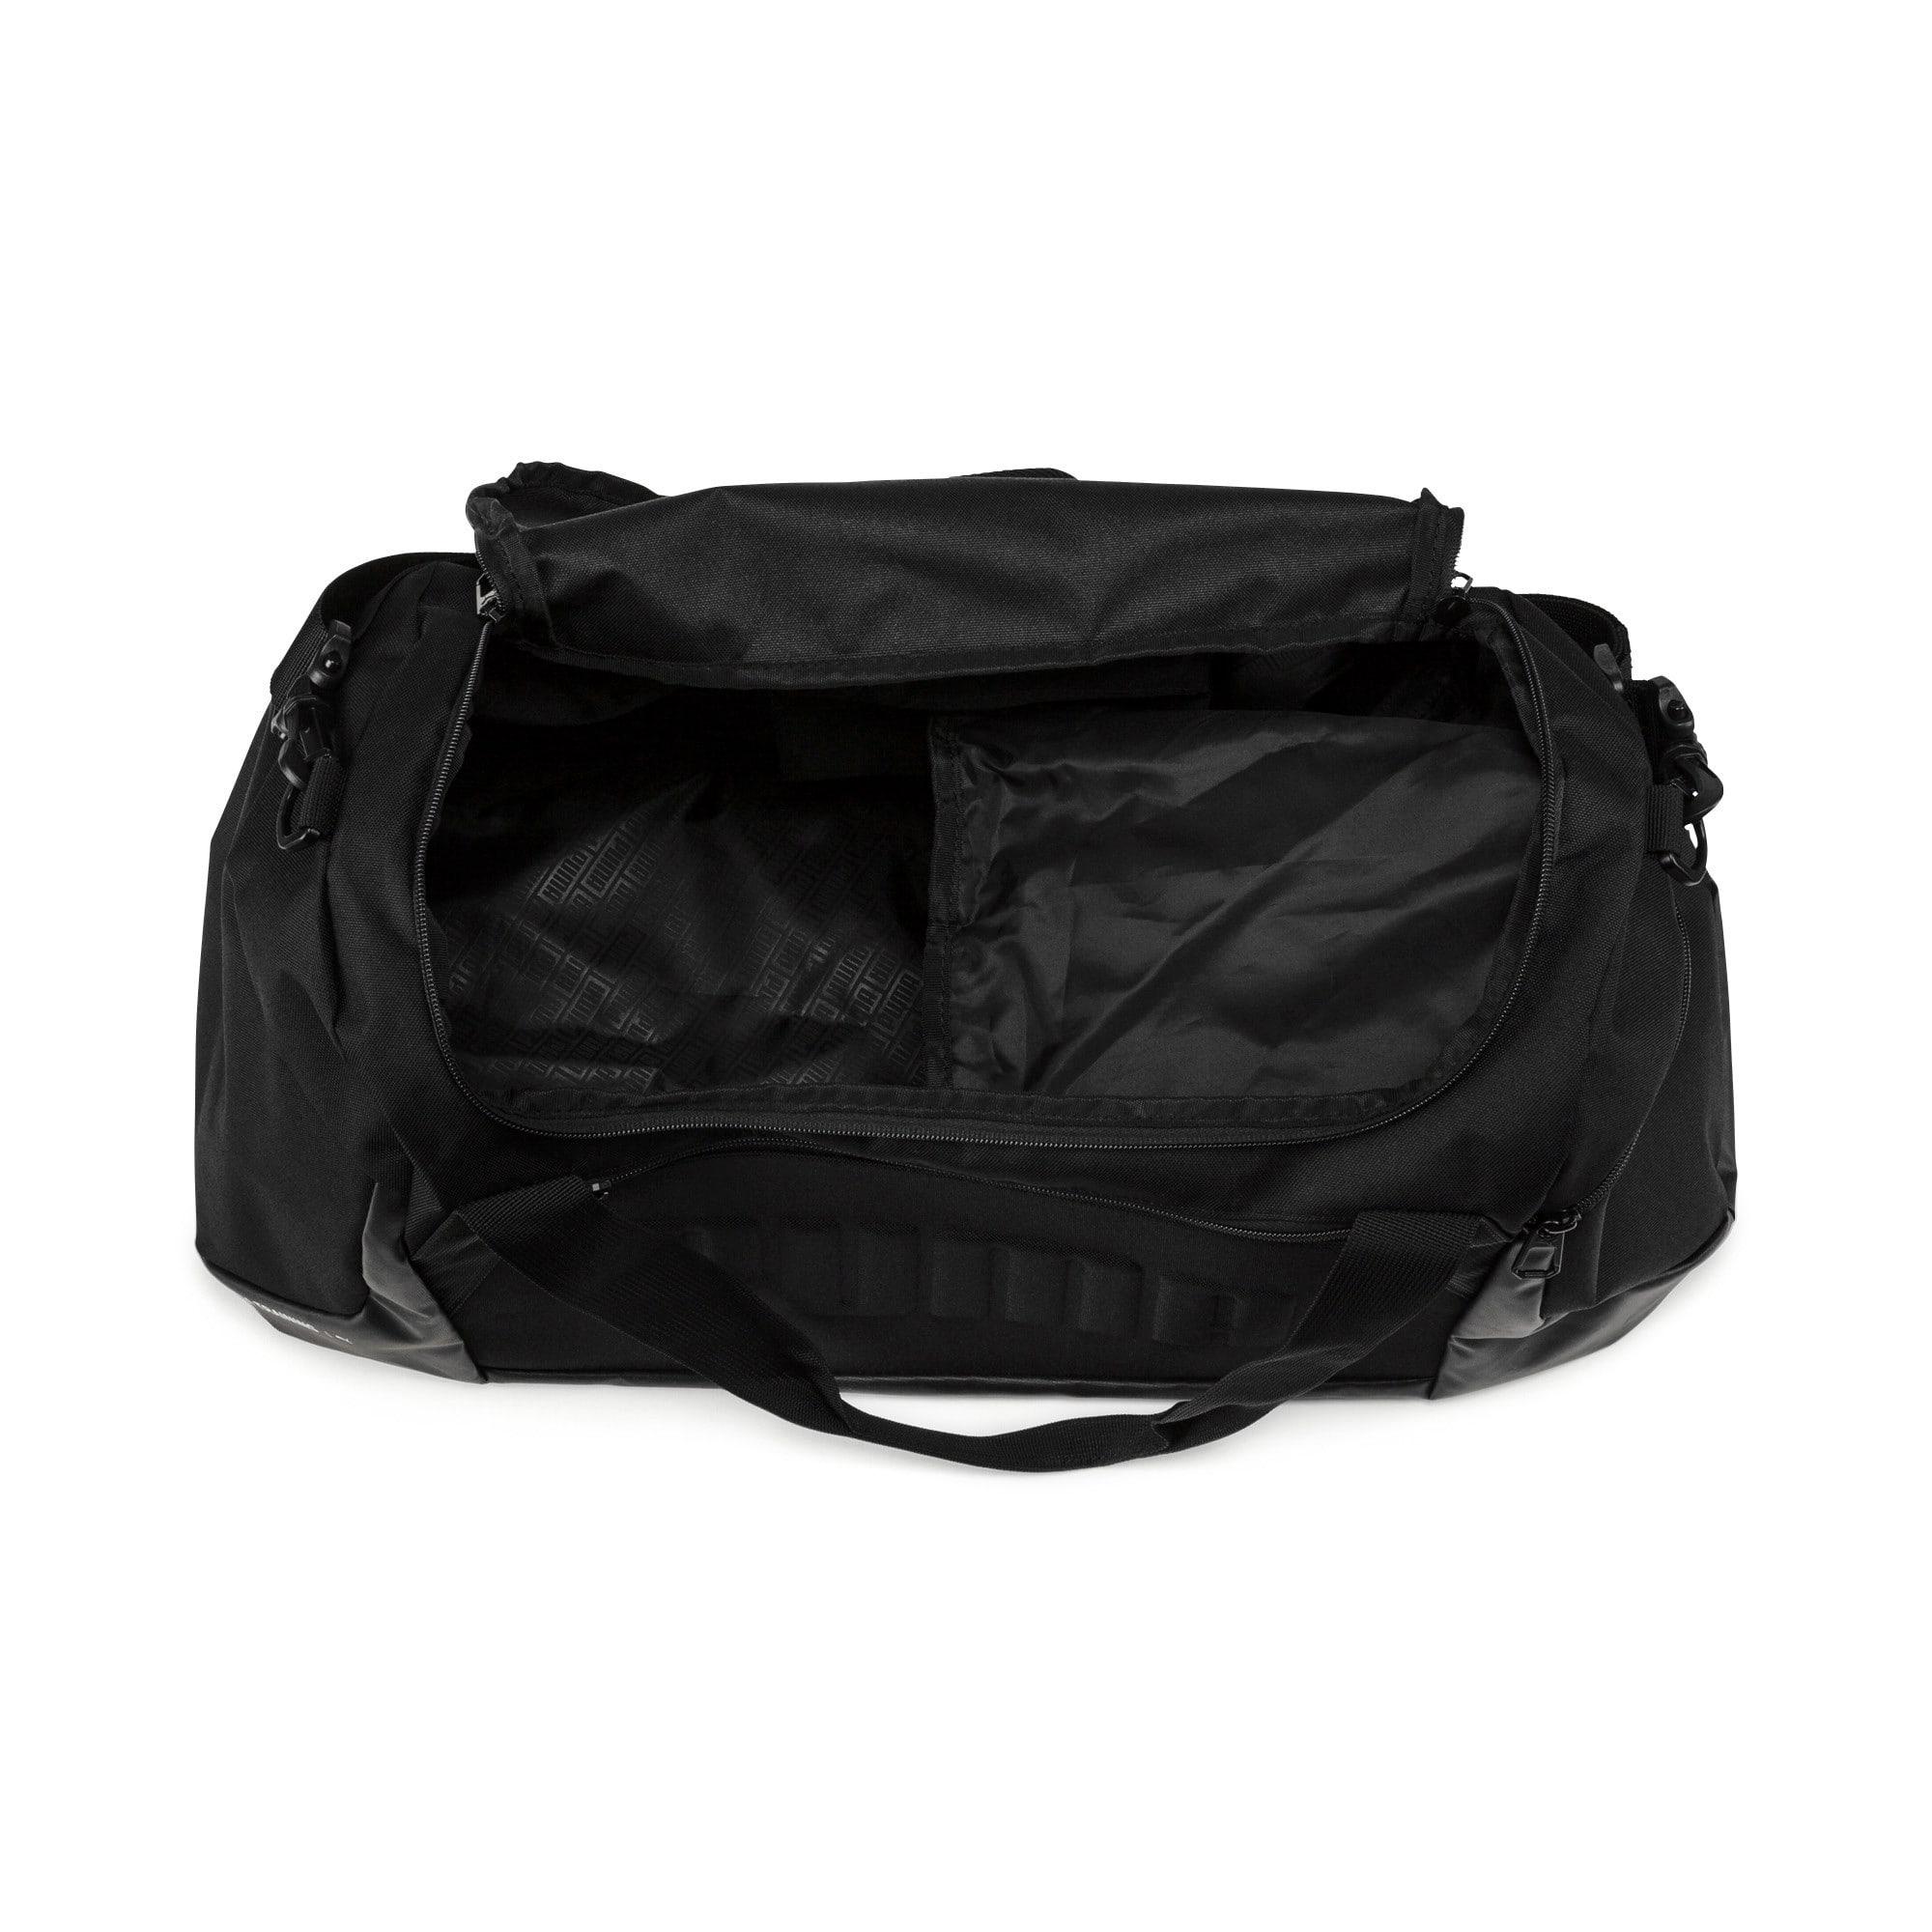 Thumbnail 4 of GYM Medium Duffle Bag, Puma Black, medium